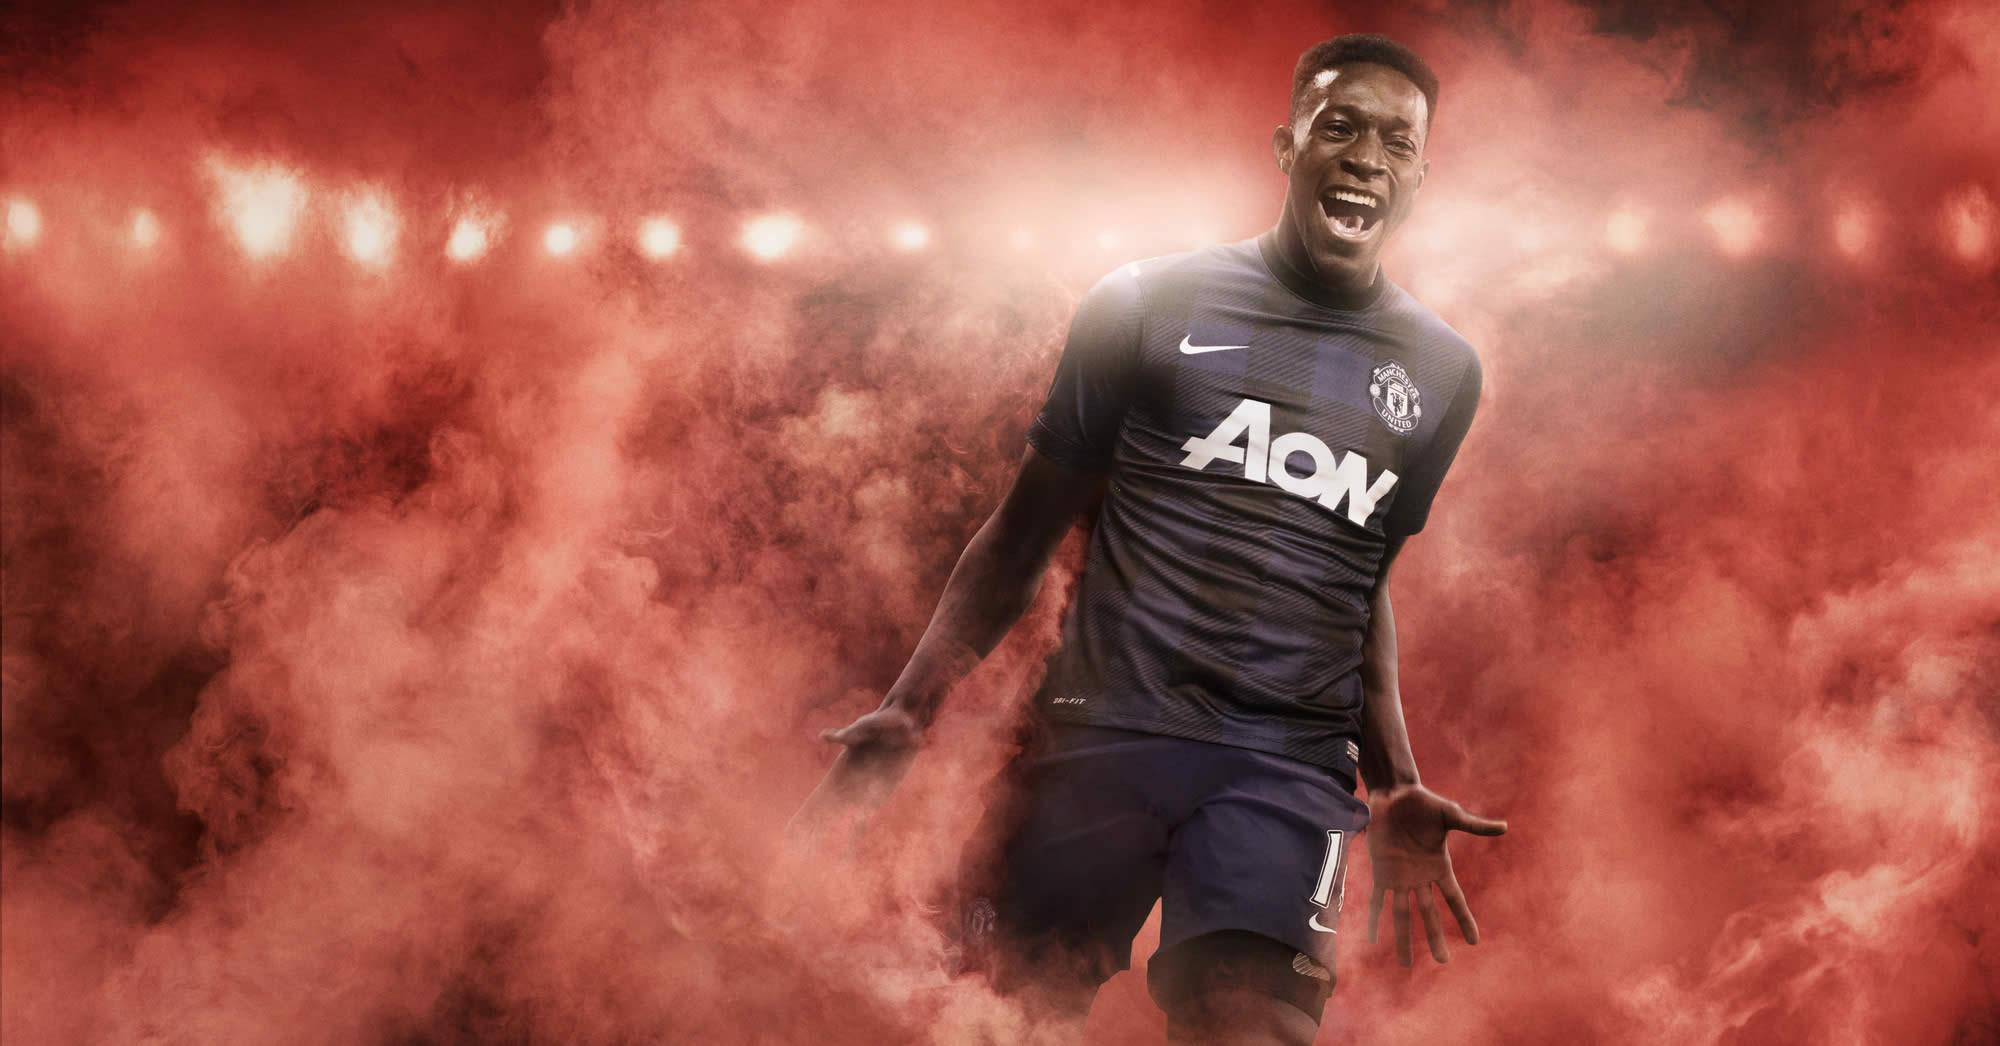 Asi luce la camiseta suplente del Manchester United | Foto Nike